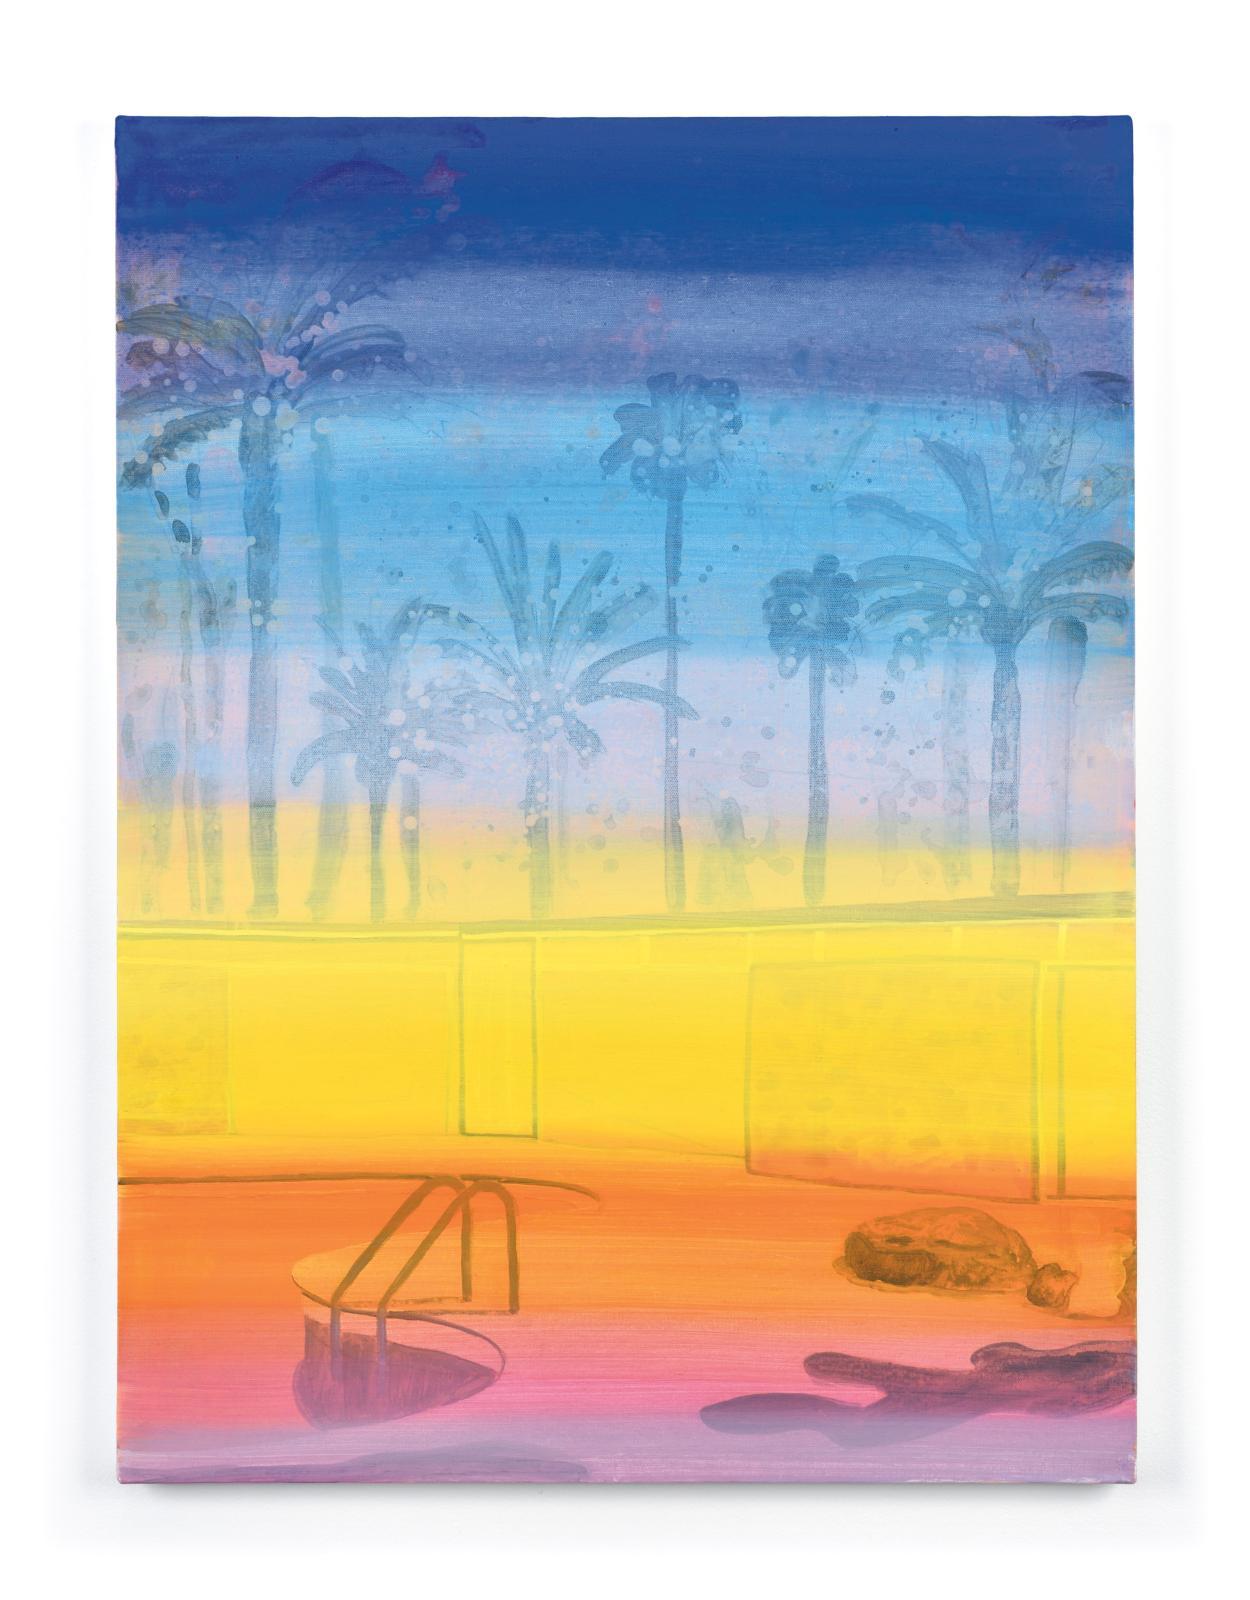 Vanessa Fanuele, Ultra 11 ,2020, huile sur toile, 80 x 60 cm. COURTESY GALERIE POLARIS